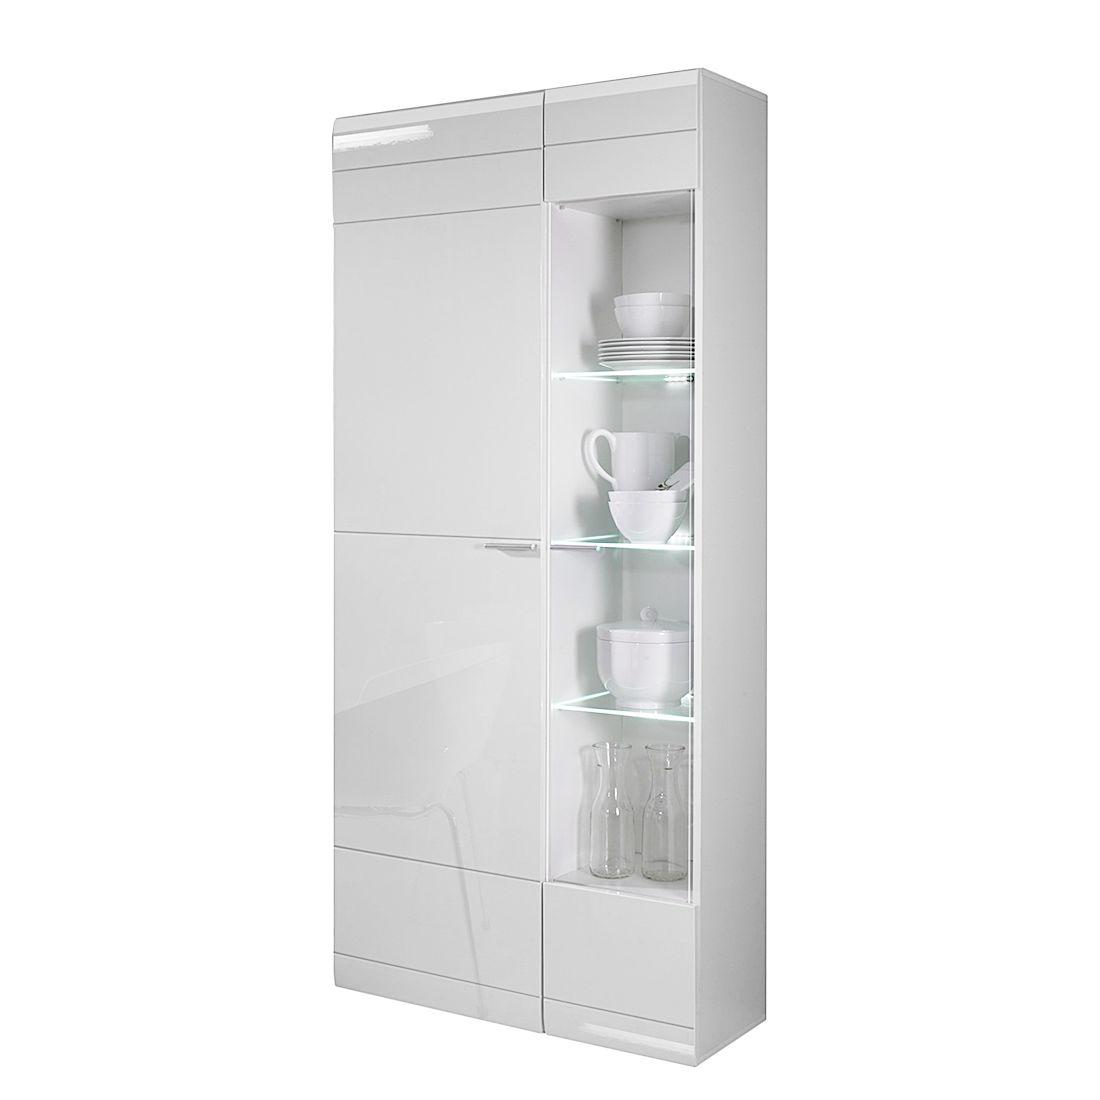 vitrine carero hochglanz wei t ranschlag links fredriks m bel24. Black Bedroom Furniture Sets. Home Design Ideas